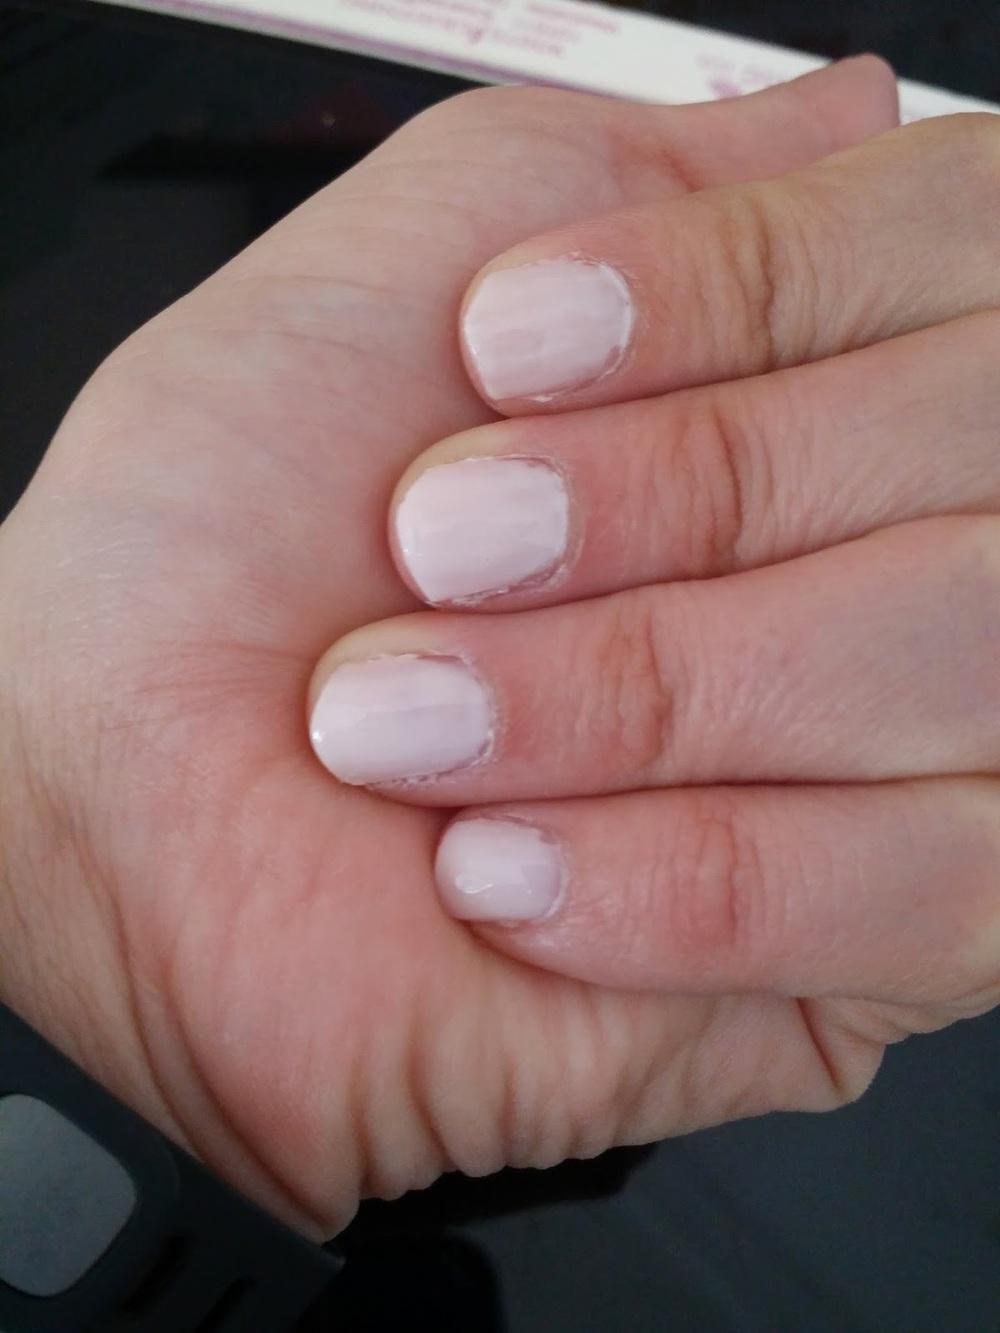 nails6-11-14.jpg